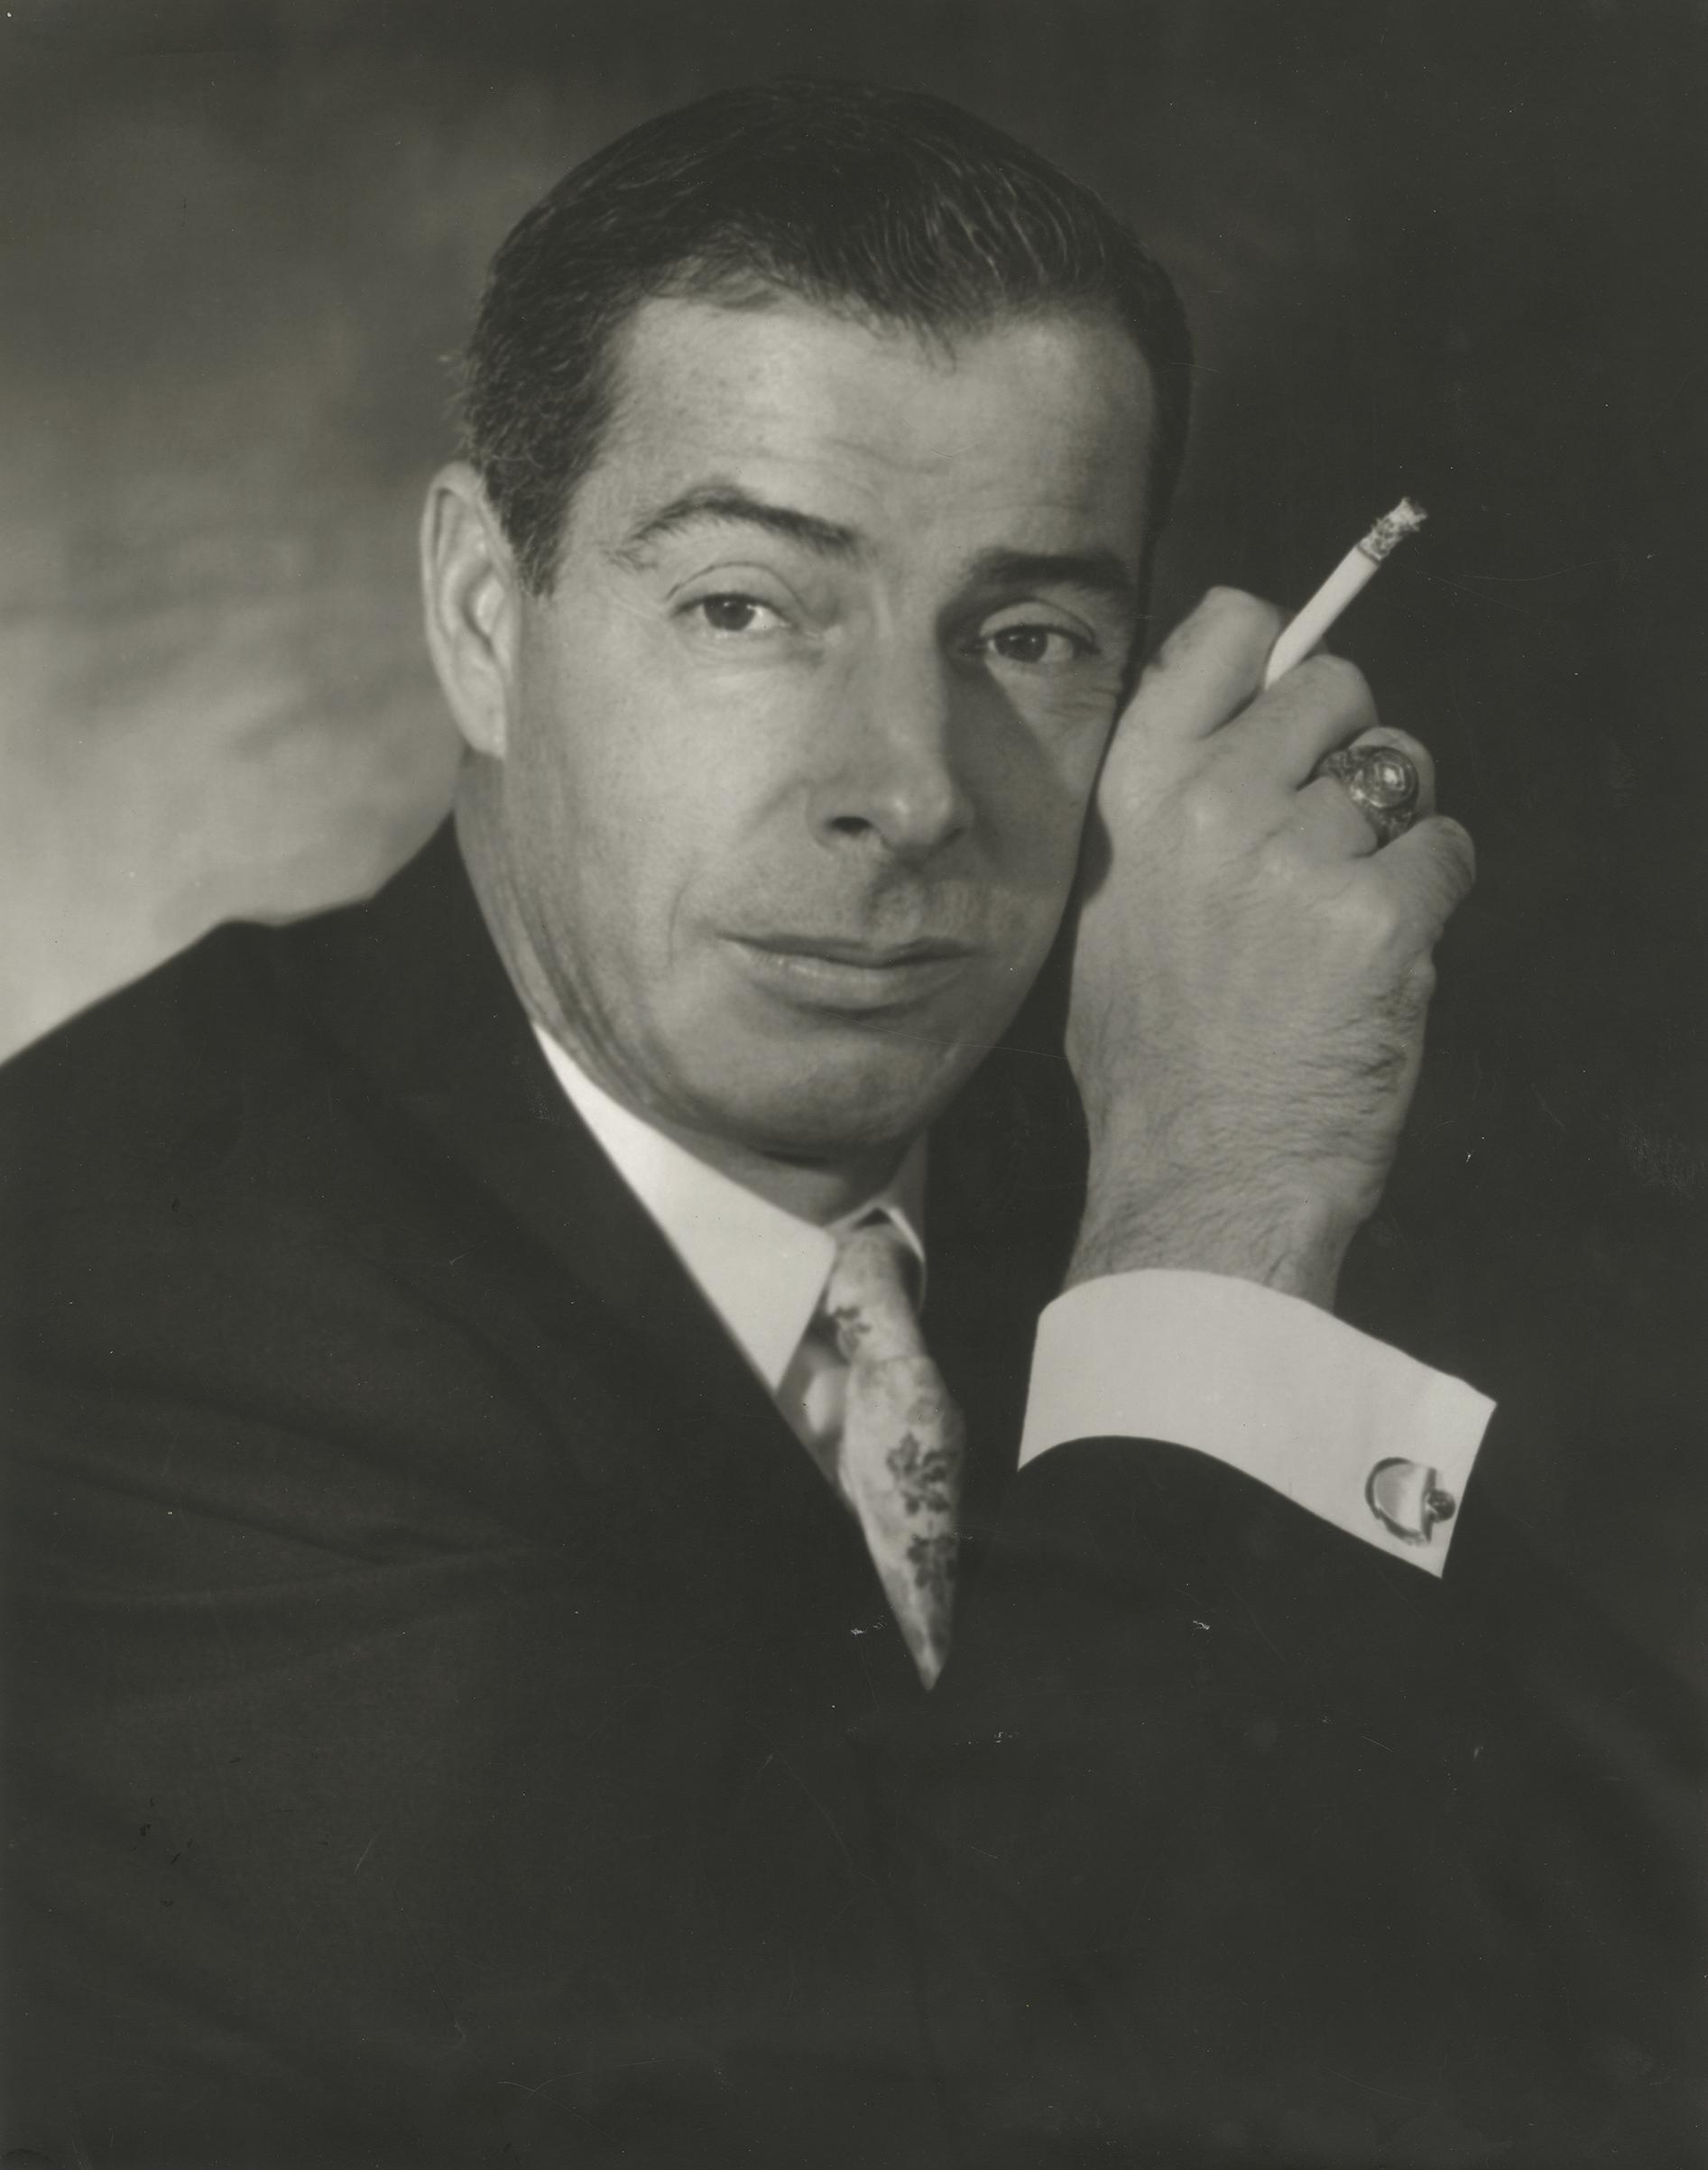 Joe DiMaggio, 1955. Gelatin silver print. New-York Historical Society, Gift of Kenneth Sherman.